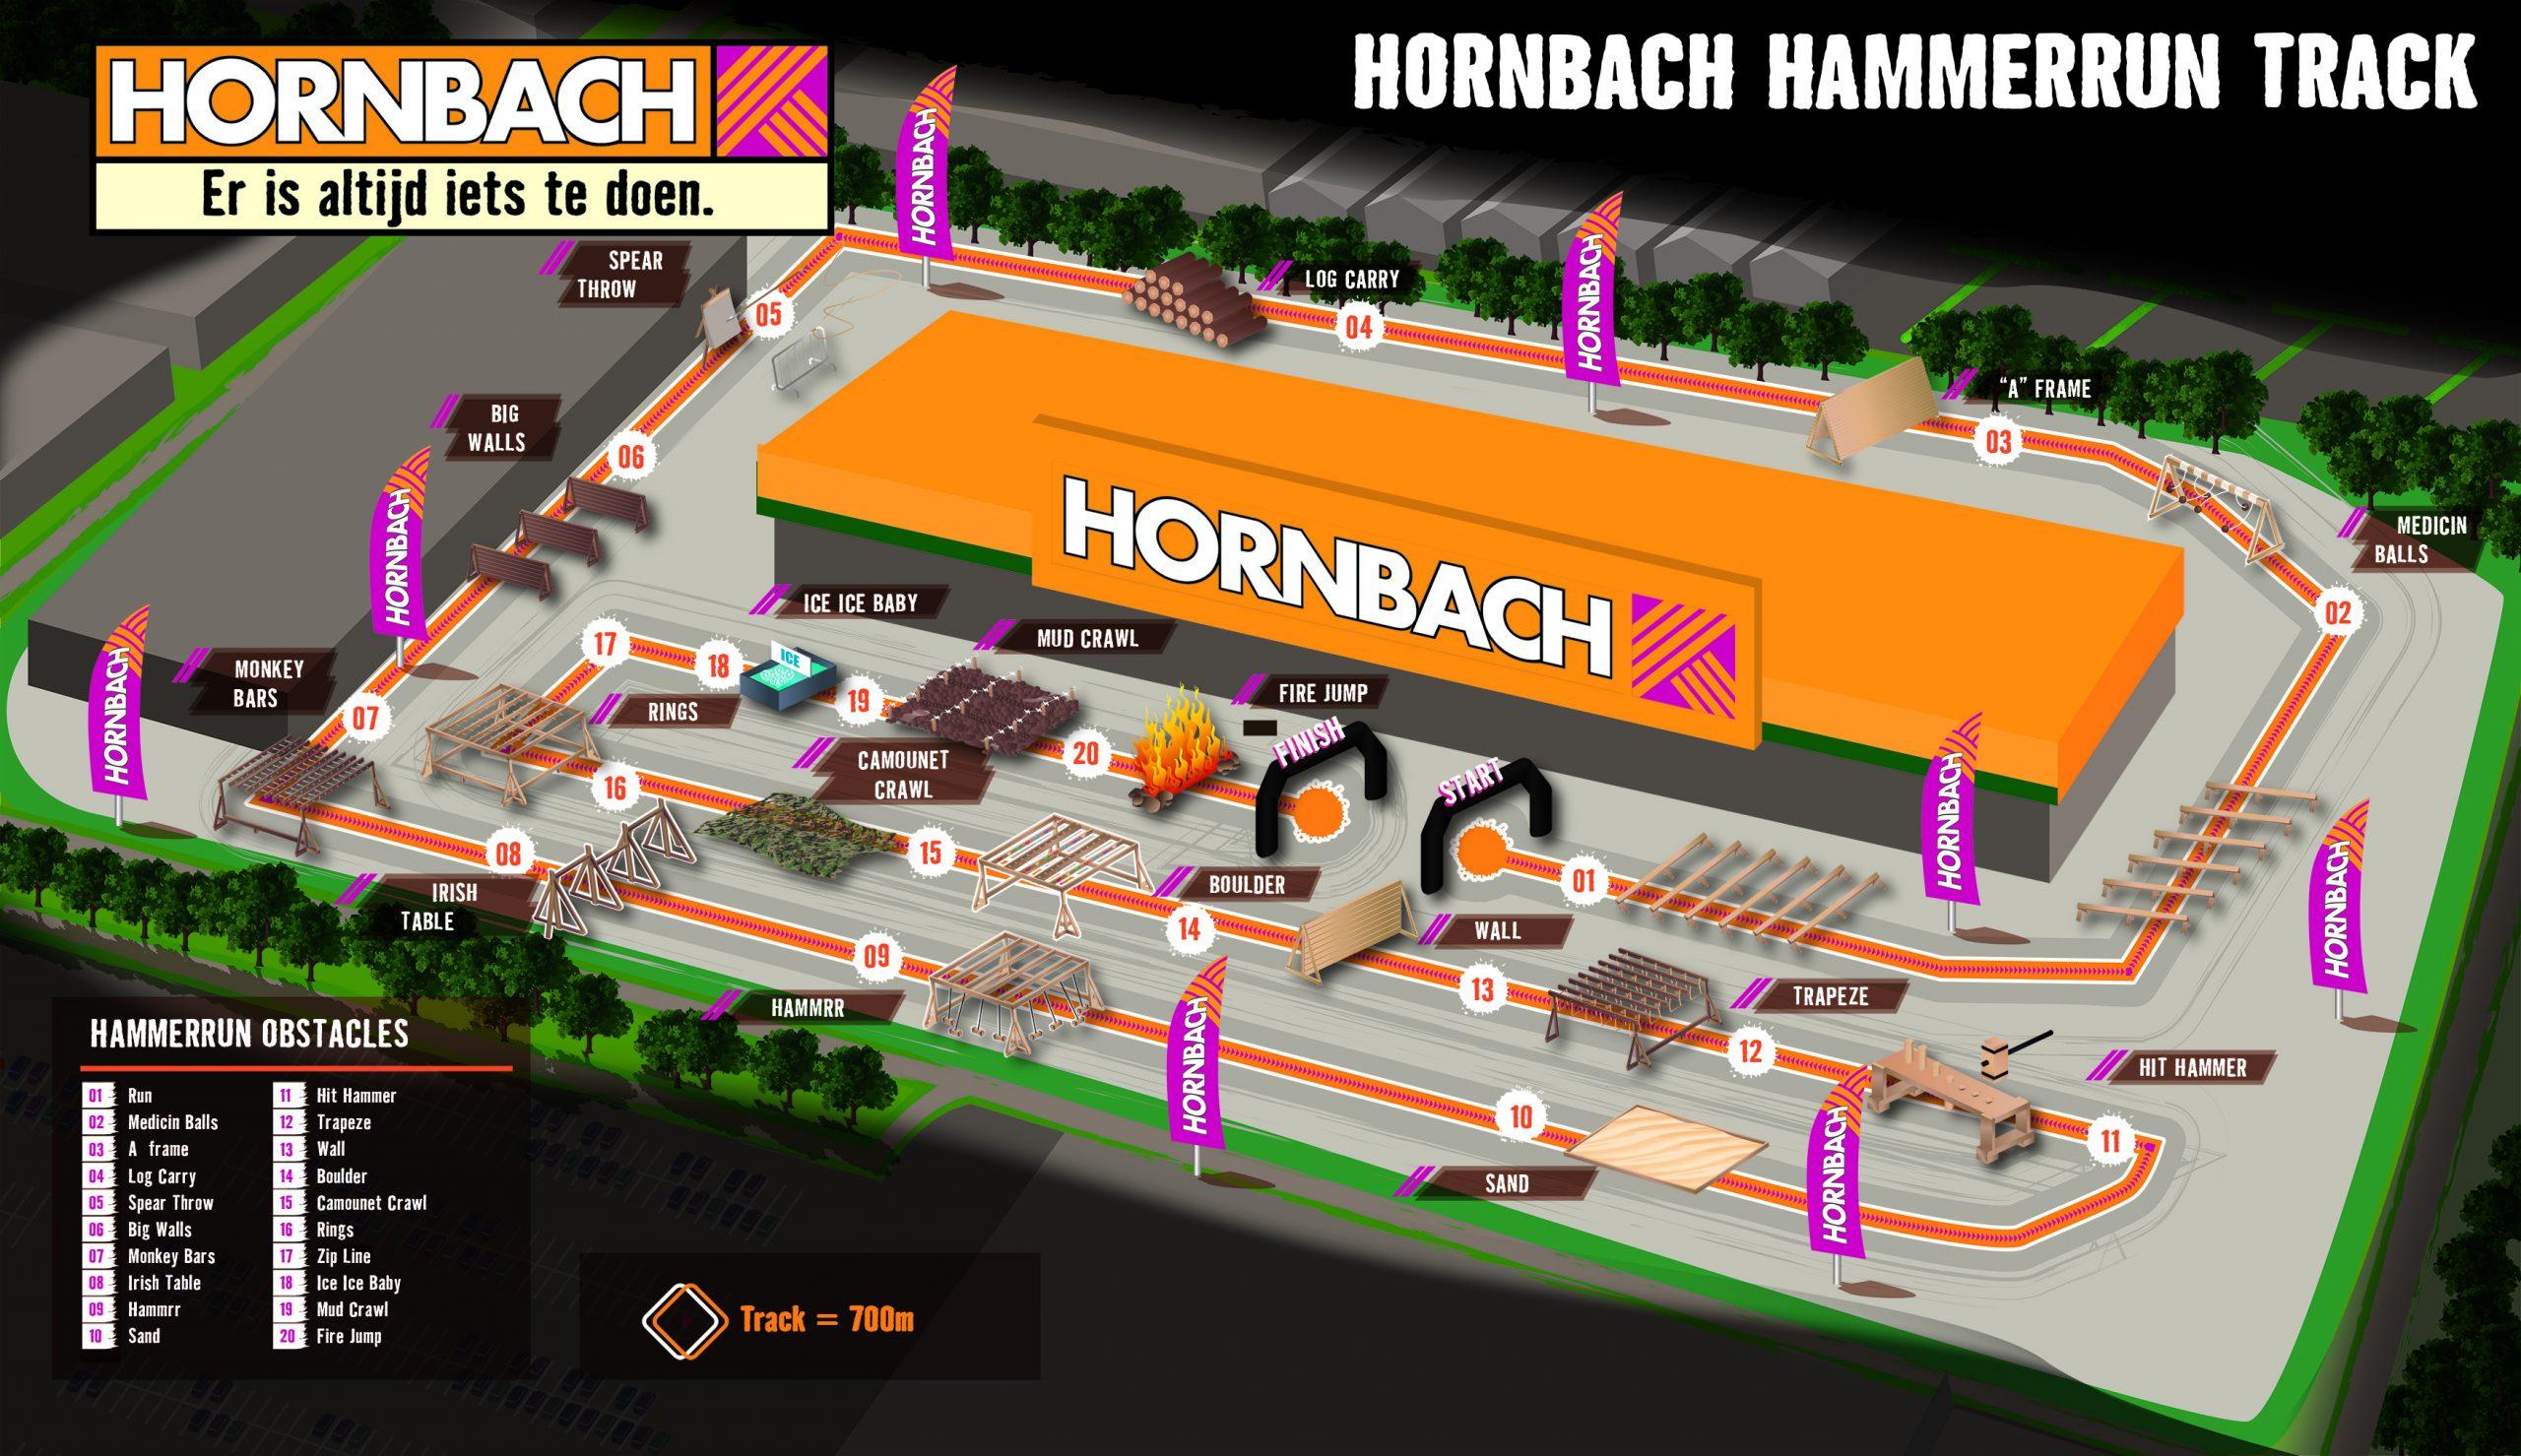 Hammerrun track